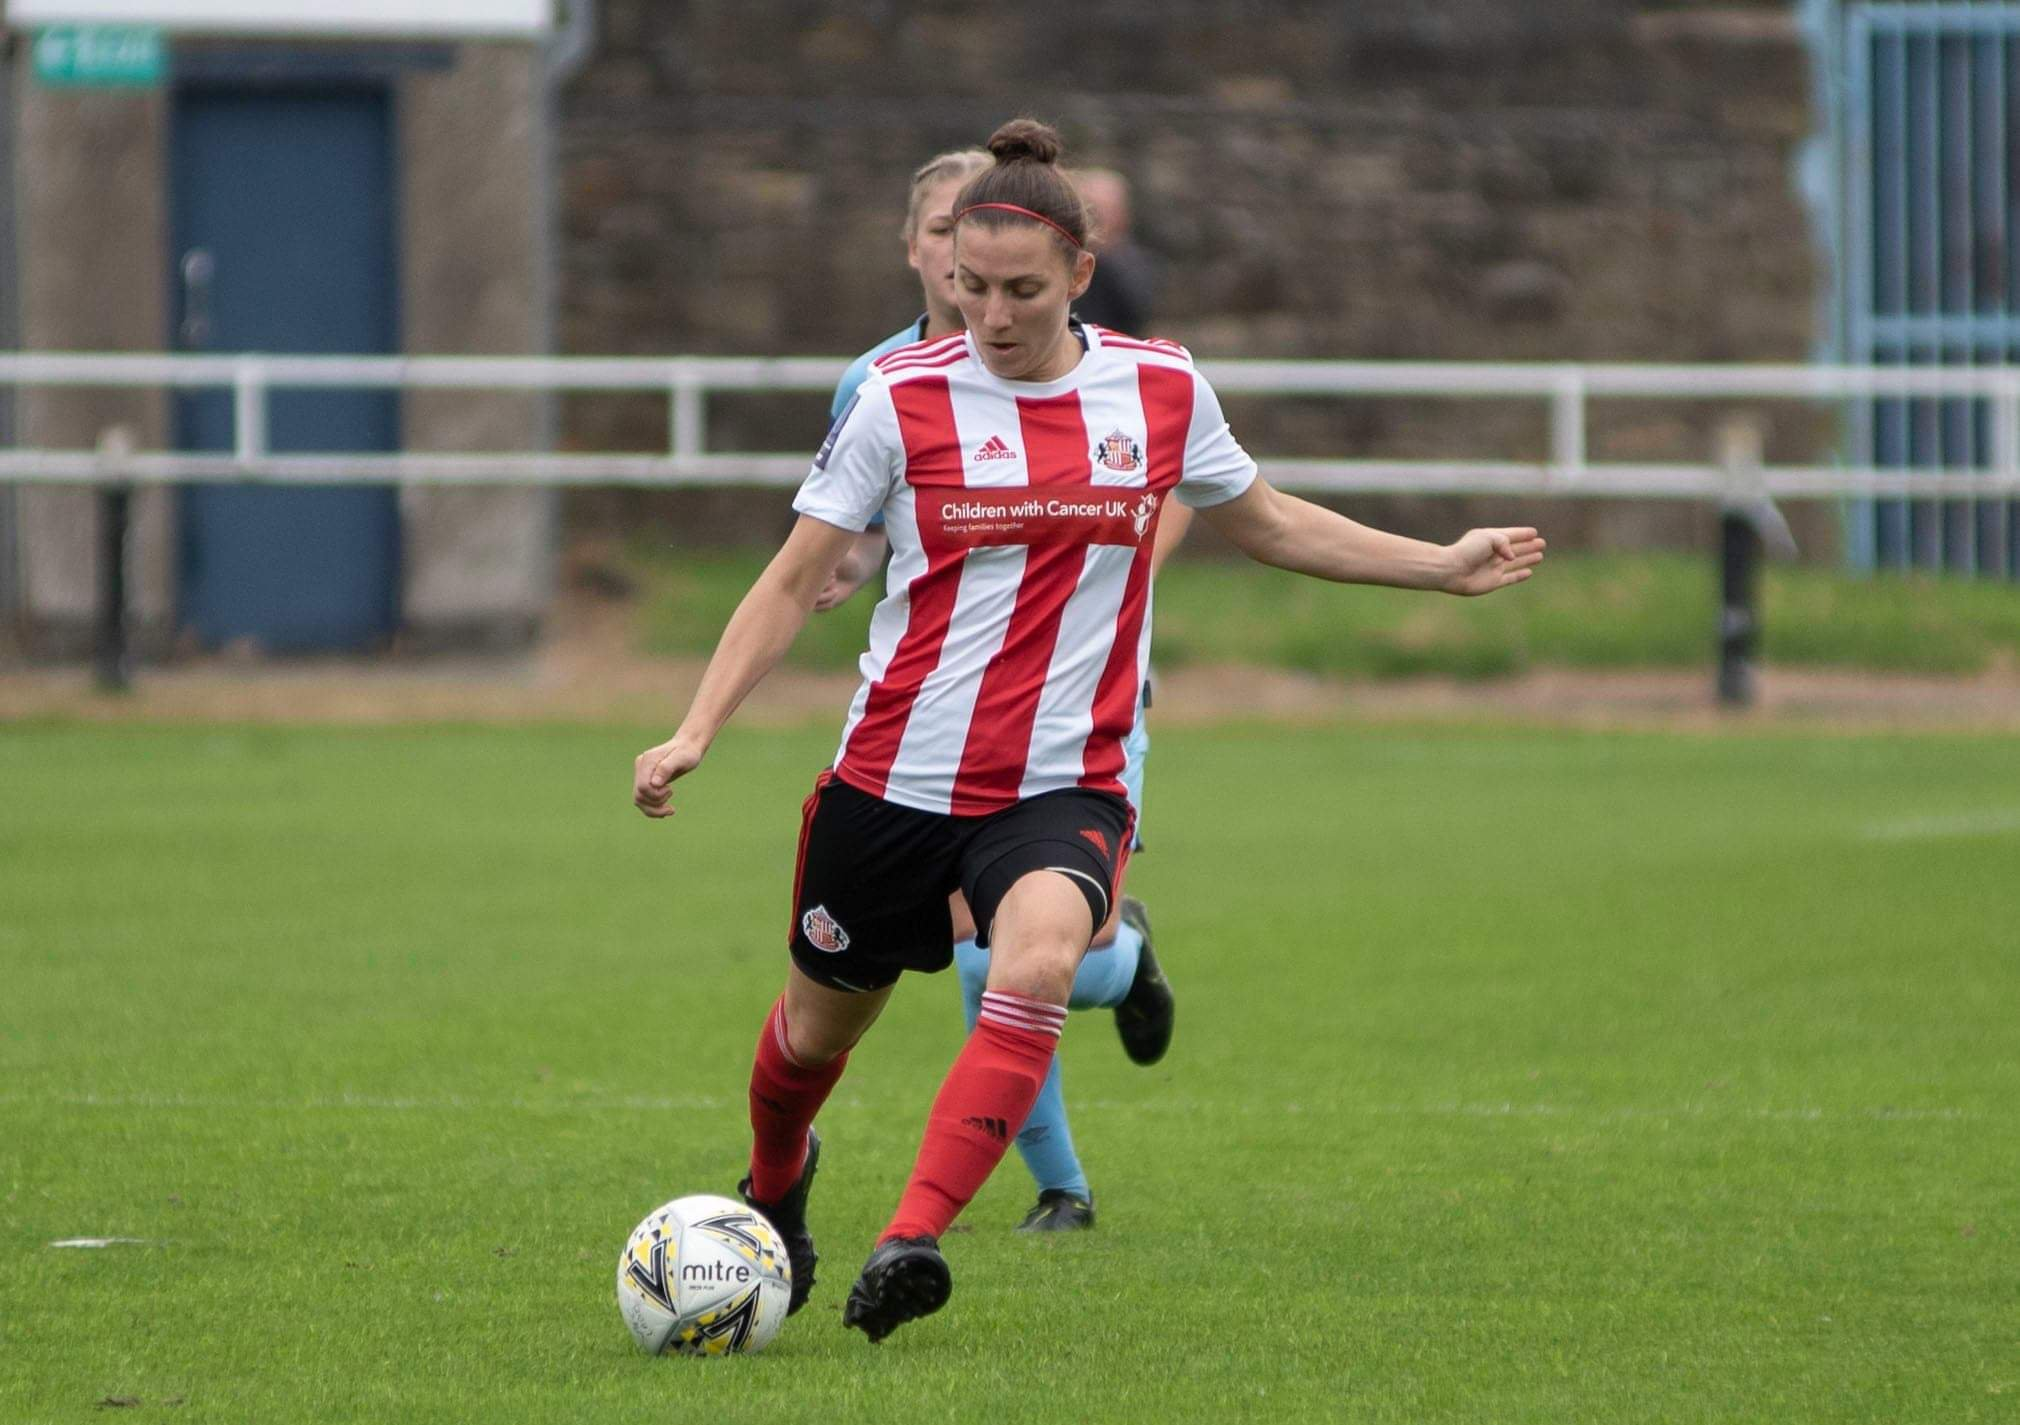 Sunderland beat Middlesbrough in sensational seven-goal thriller to cap Women's FA Cup second round goal fest